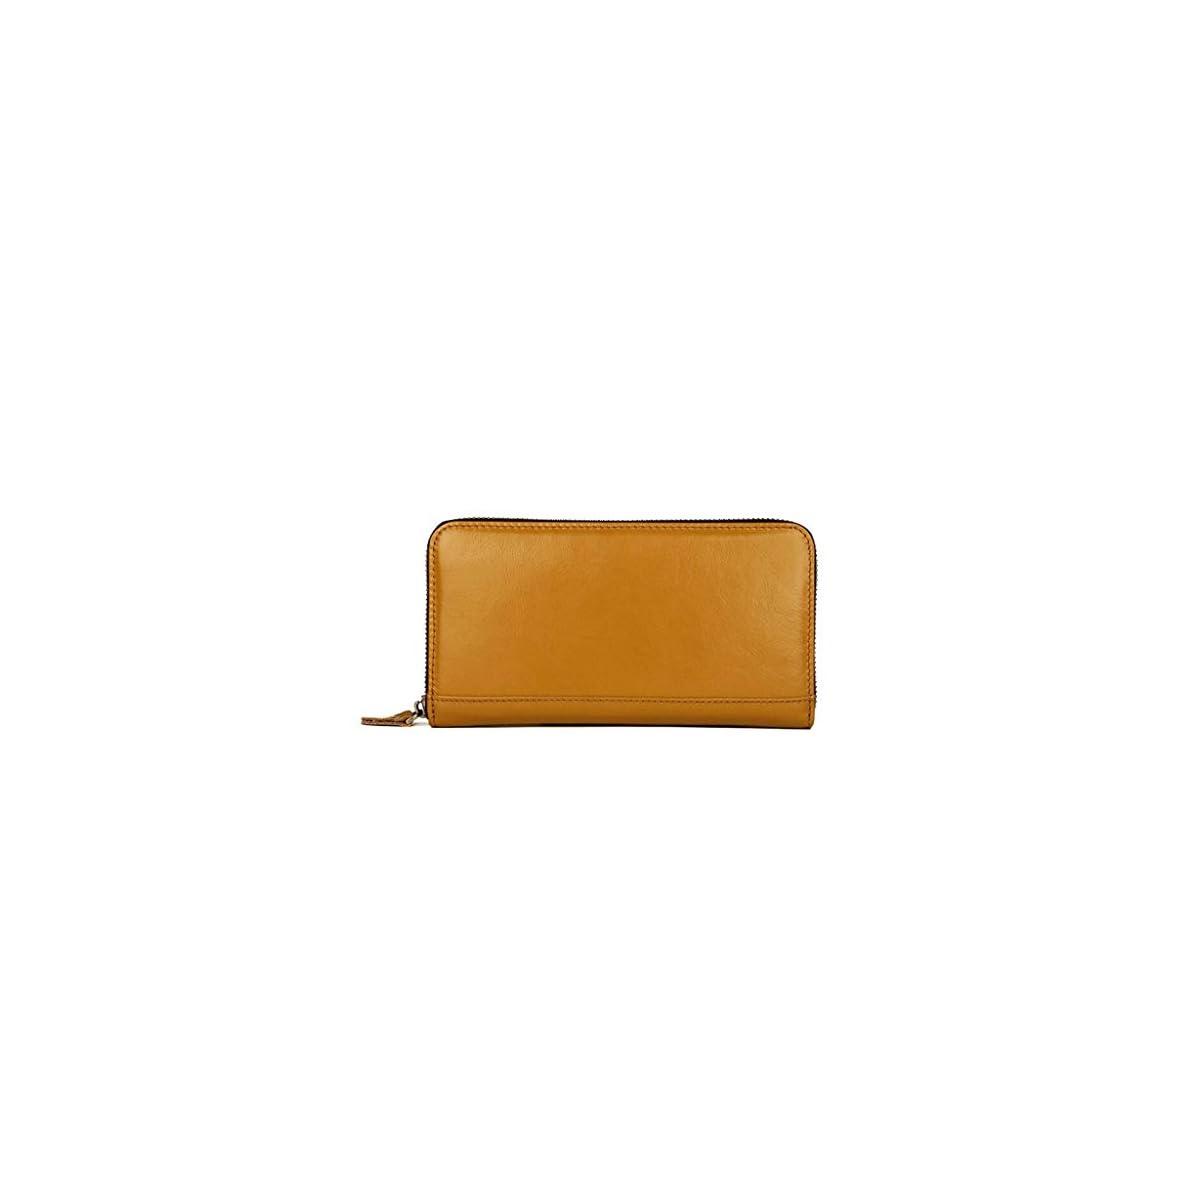 31xXjjkFmdL. SS1200  - TIDING Paquete de tarjetas de billetera casual de negocios